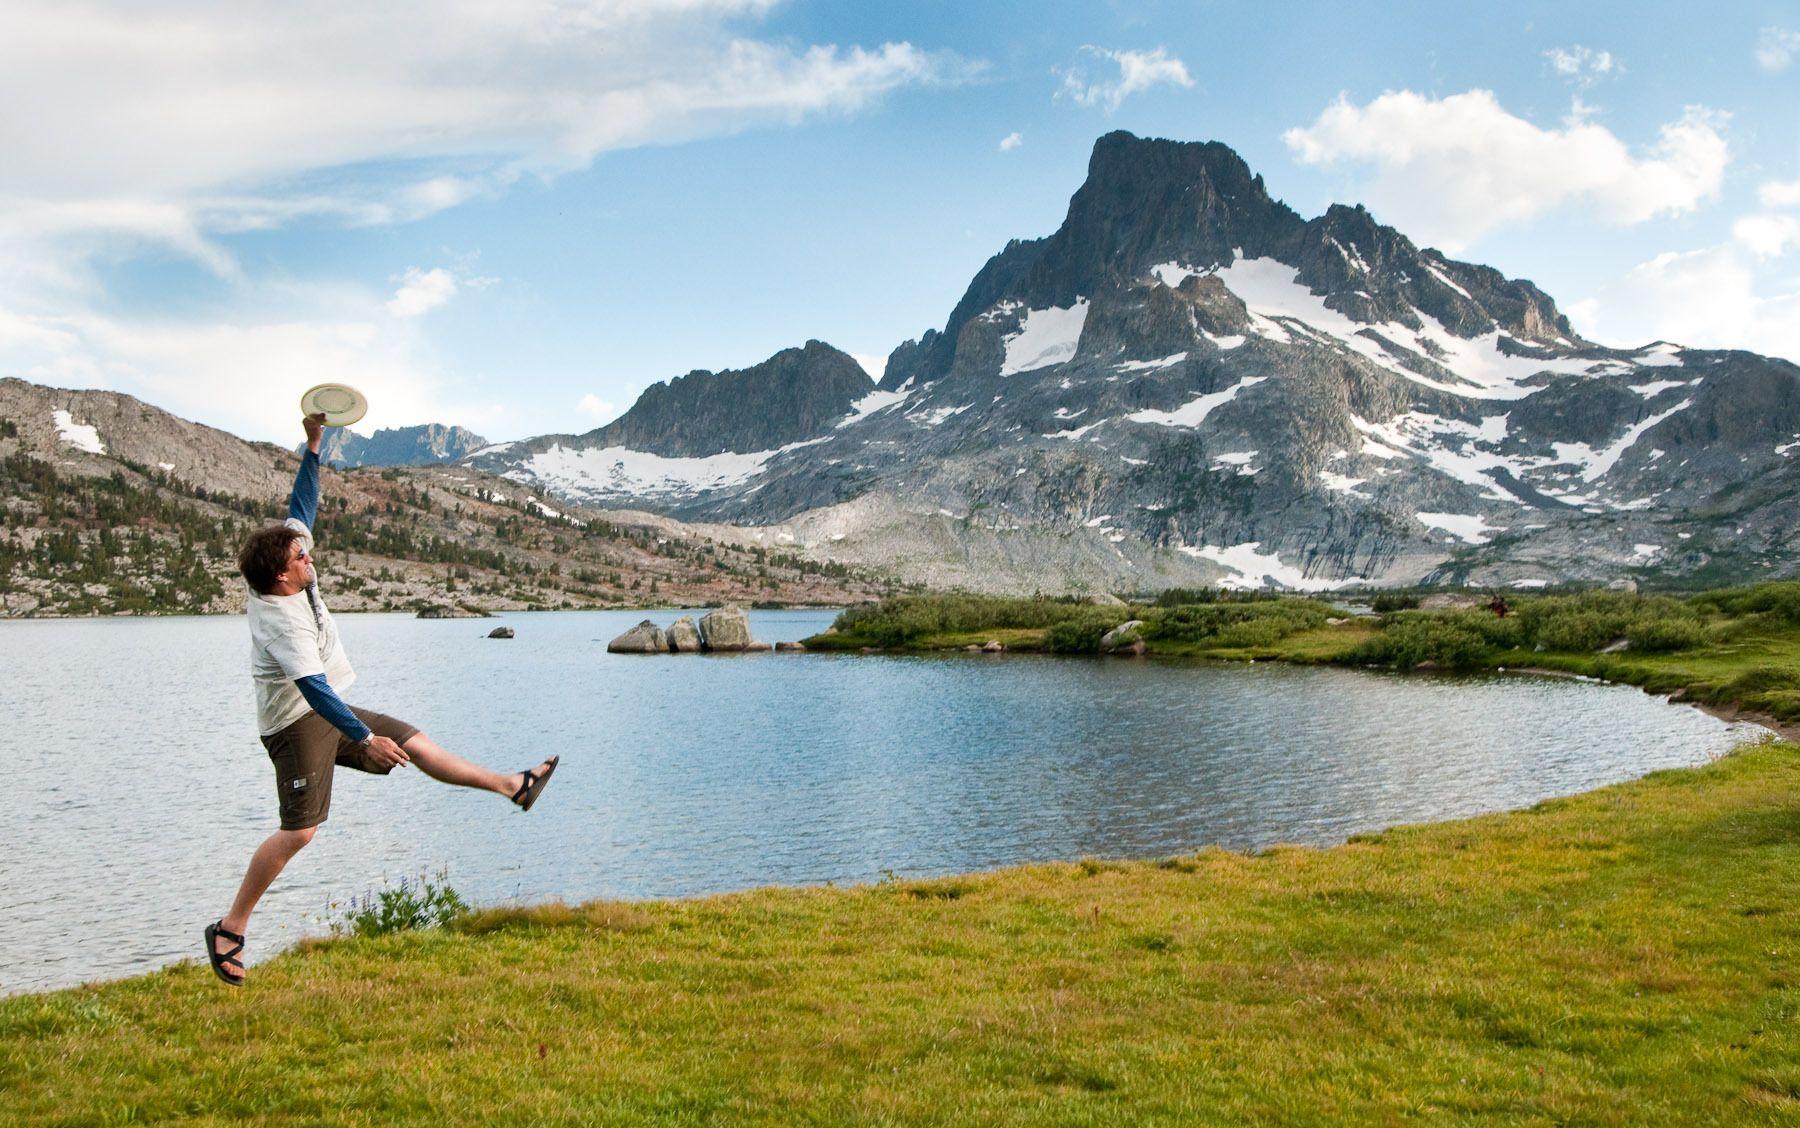 Man Playing Frisbee at Thousand Island Lake